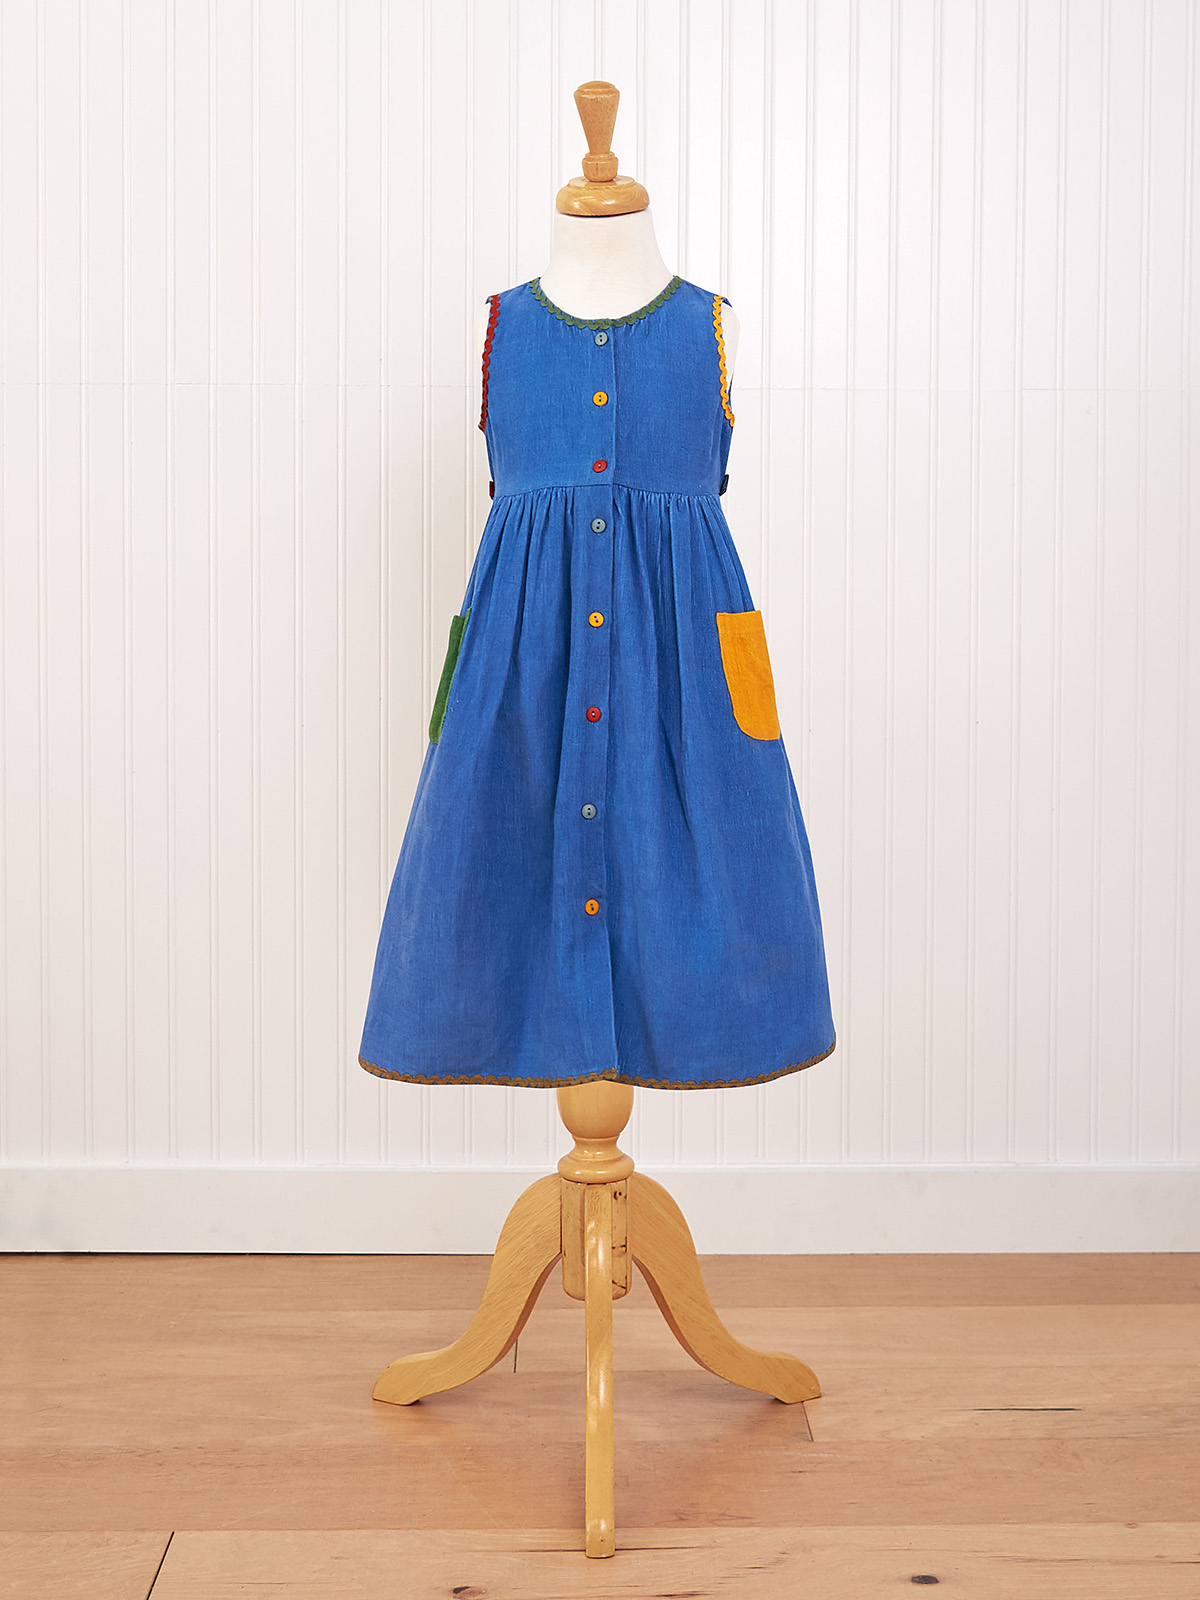 Back to School Girls Dress